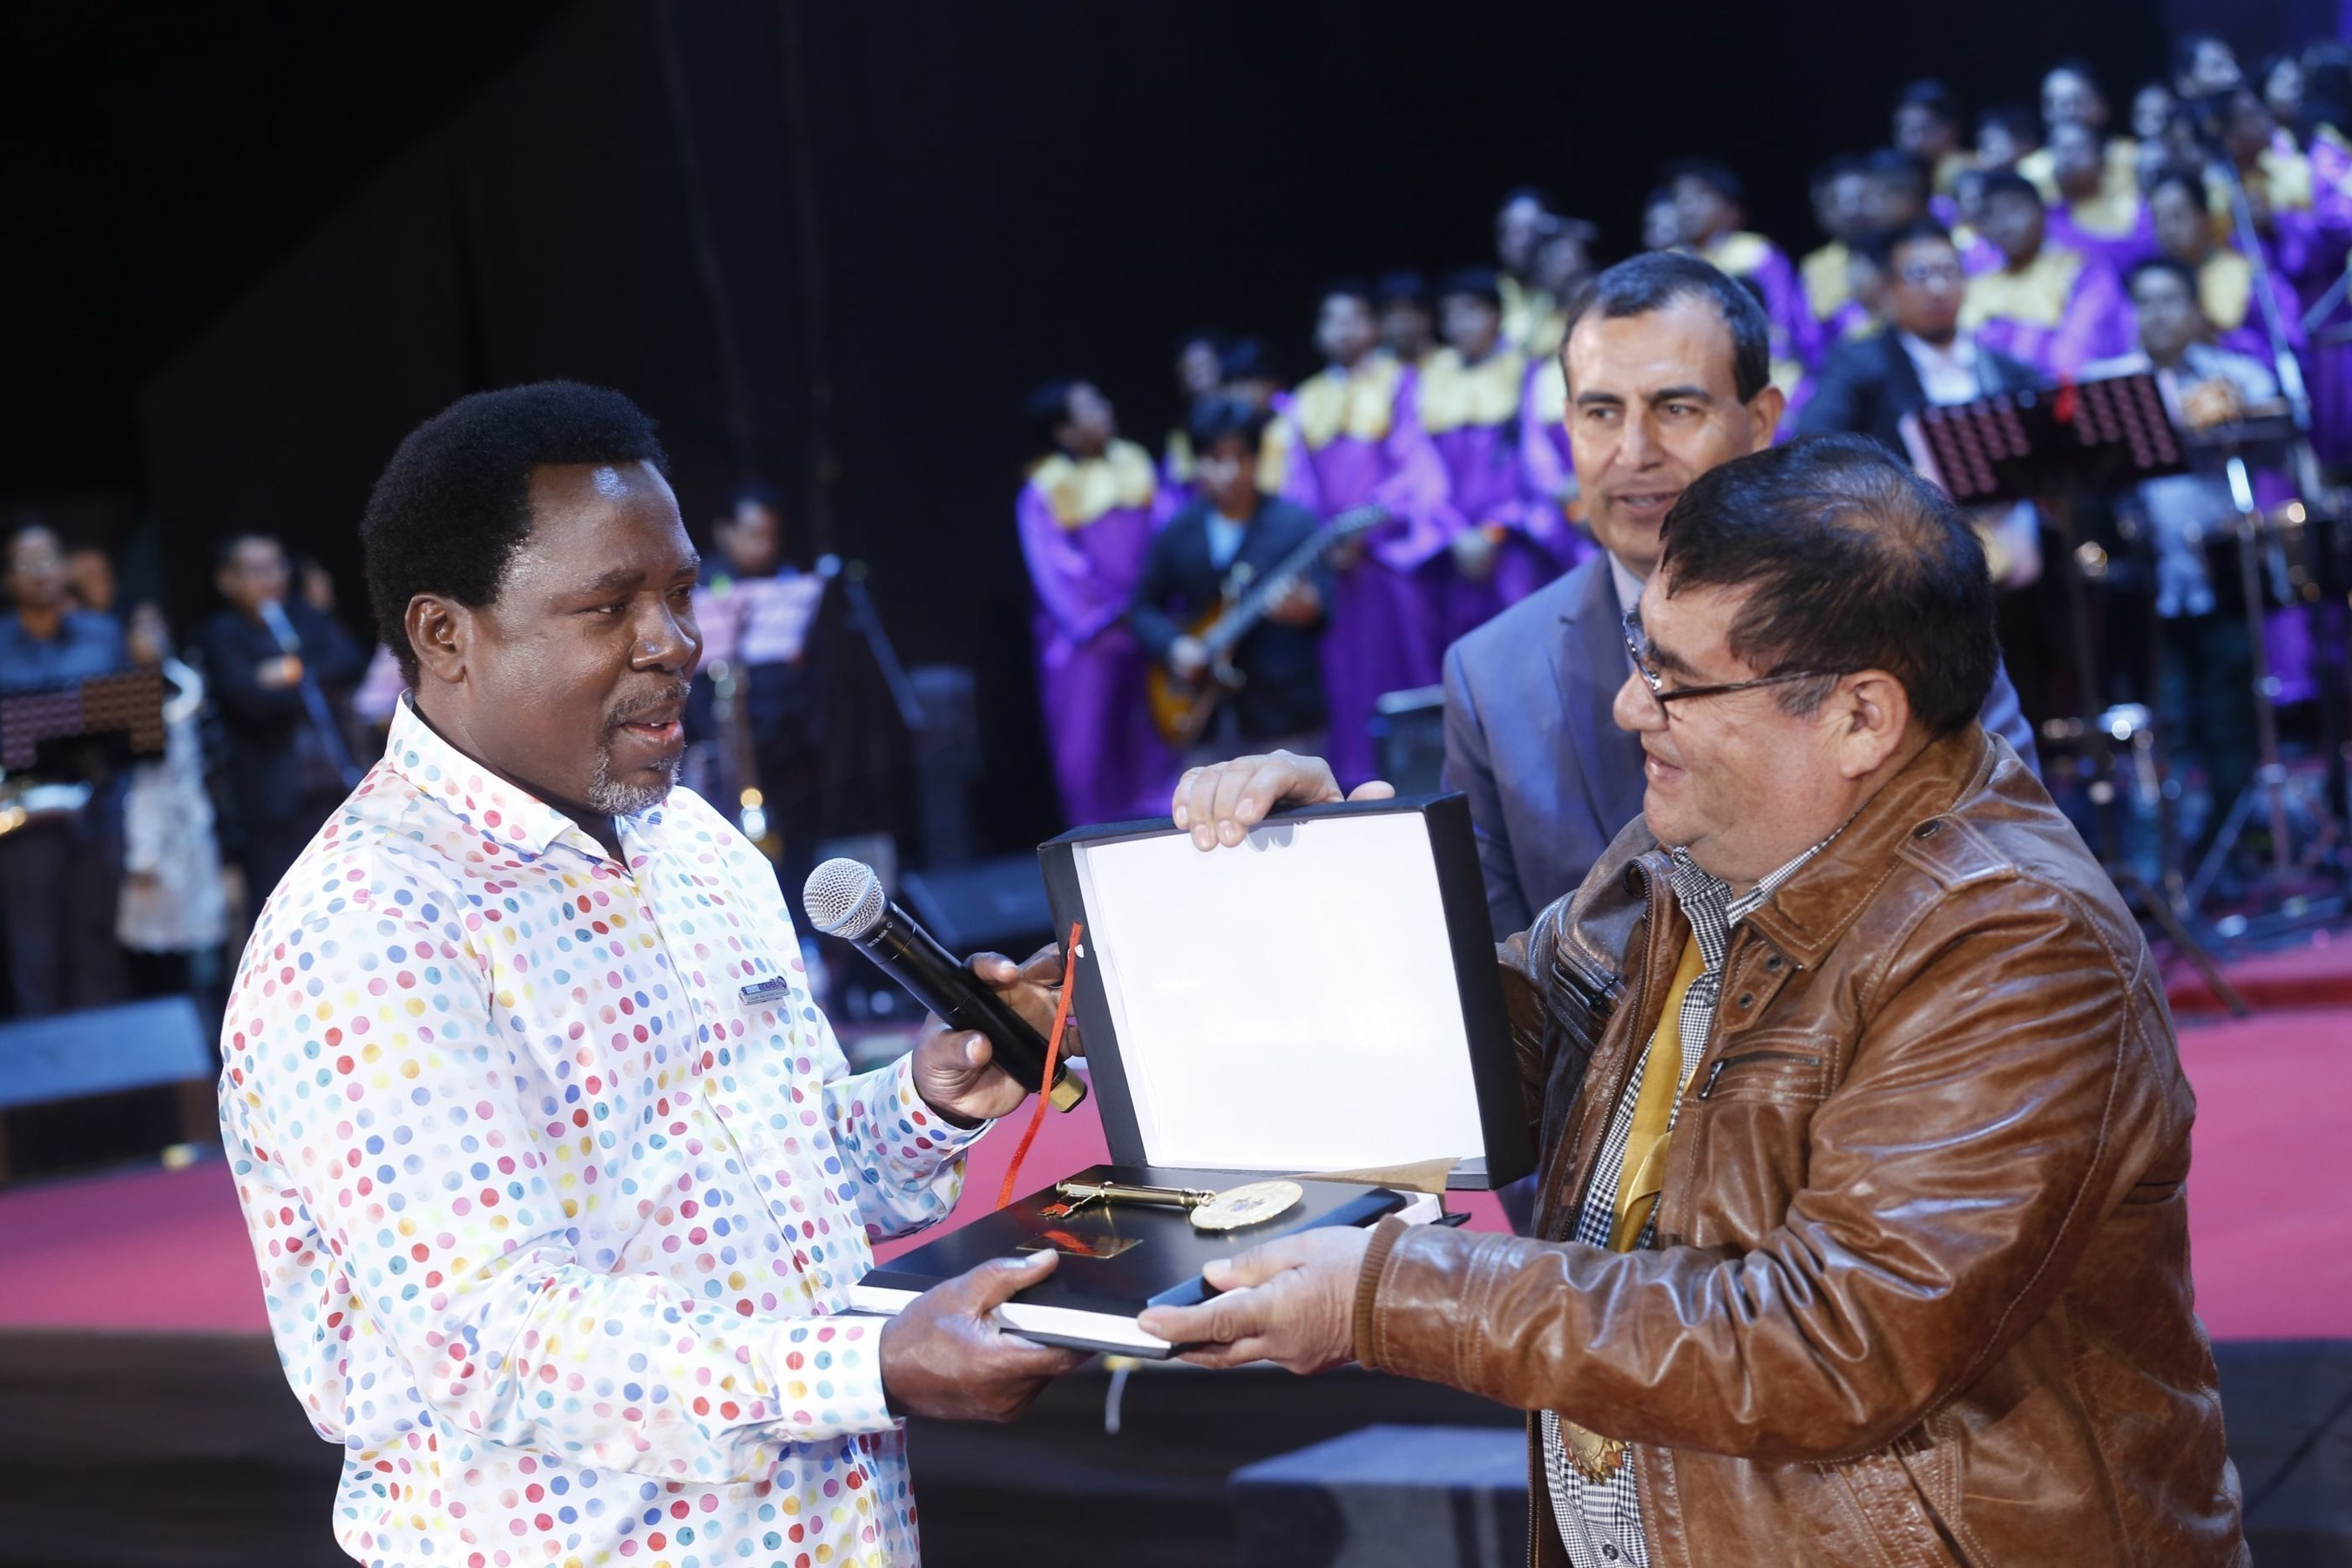 The Mayor of La Victoria, Elias Cuba Bautista, presents T.B. Joshua with the Key of the City of Lima. (PRNewsFoto/Emmanuel TV)